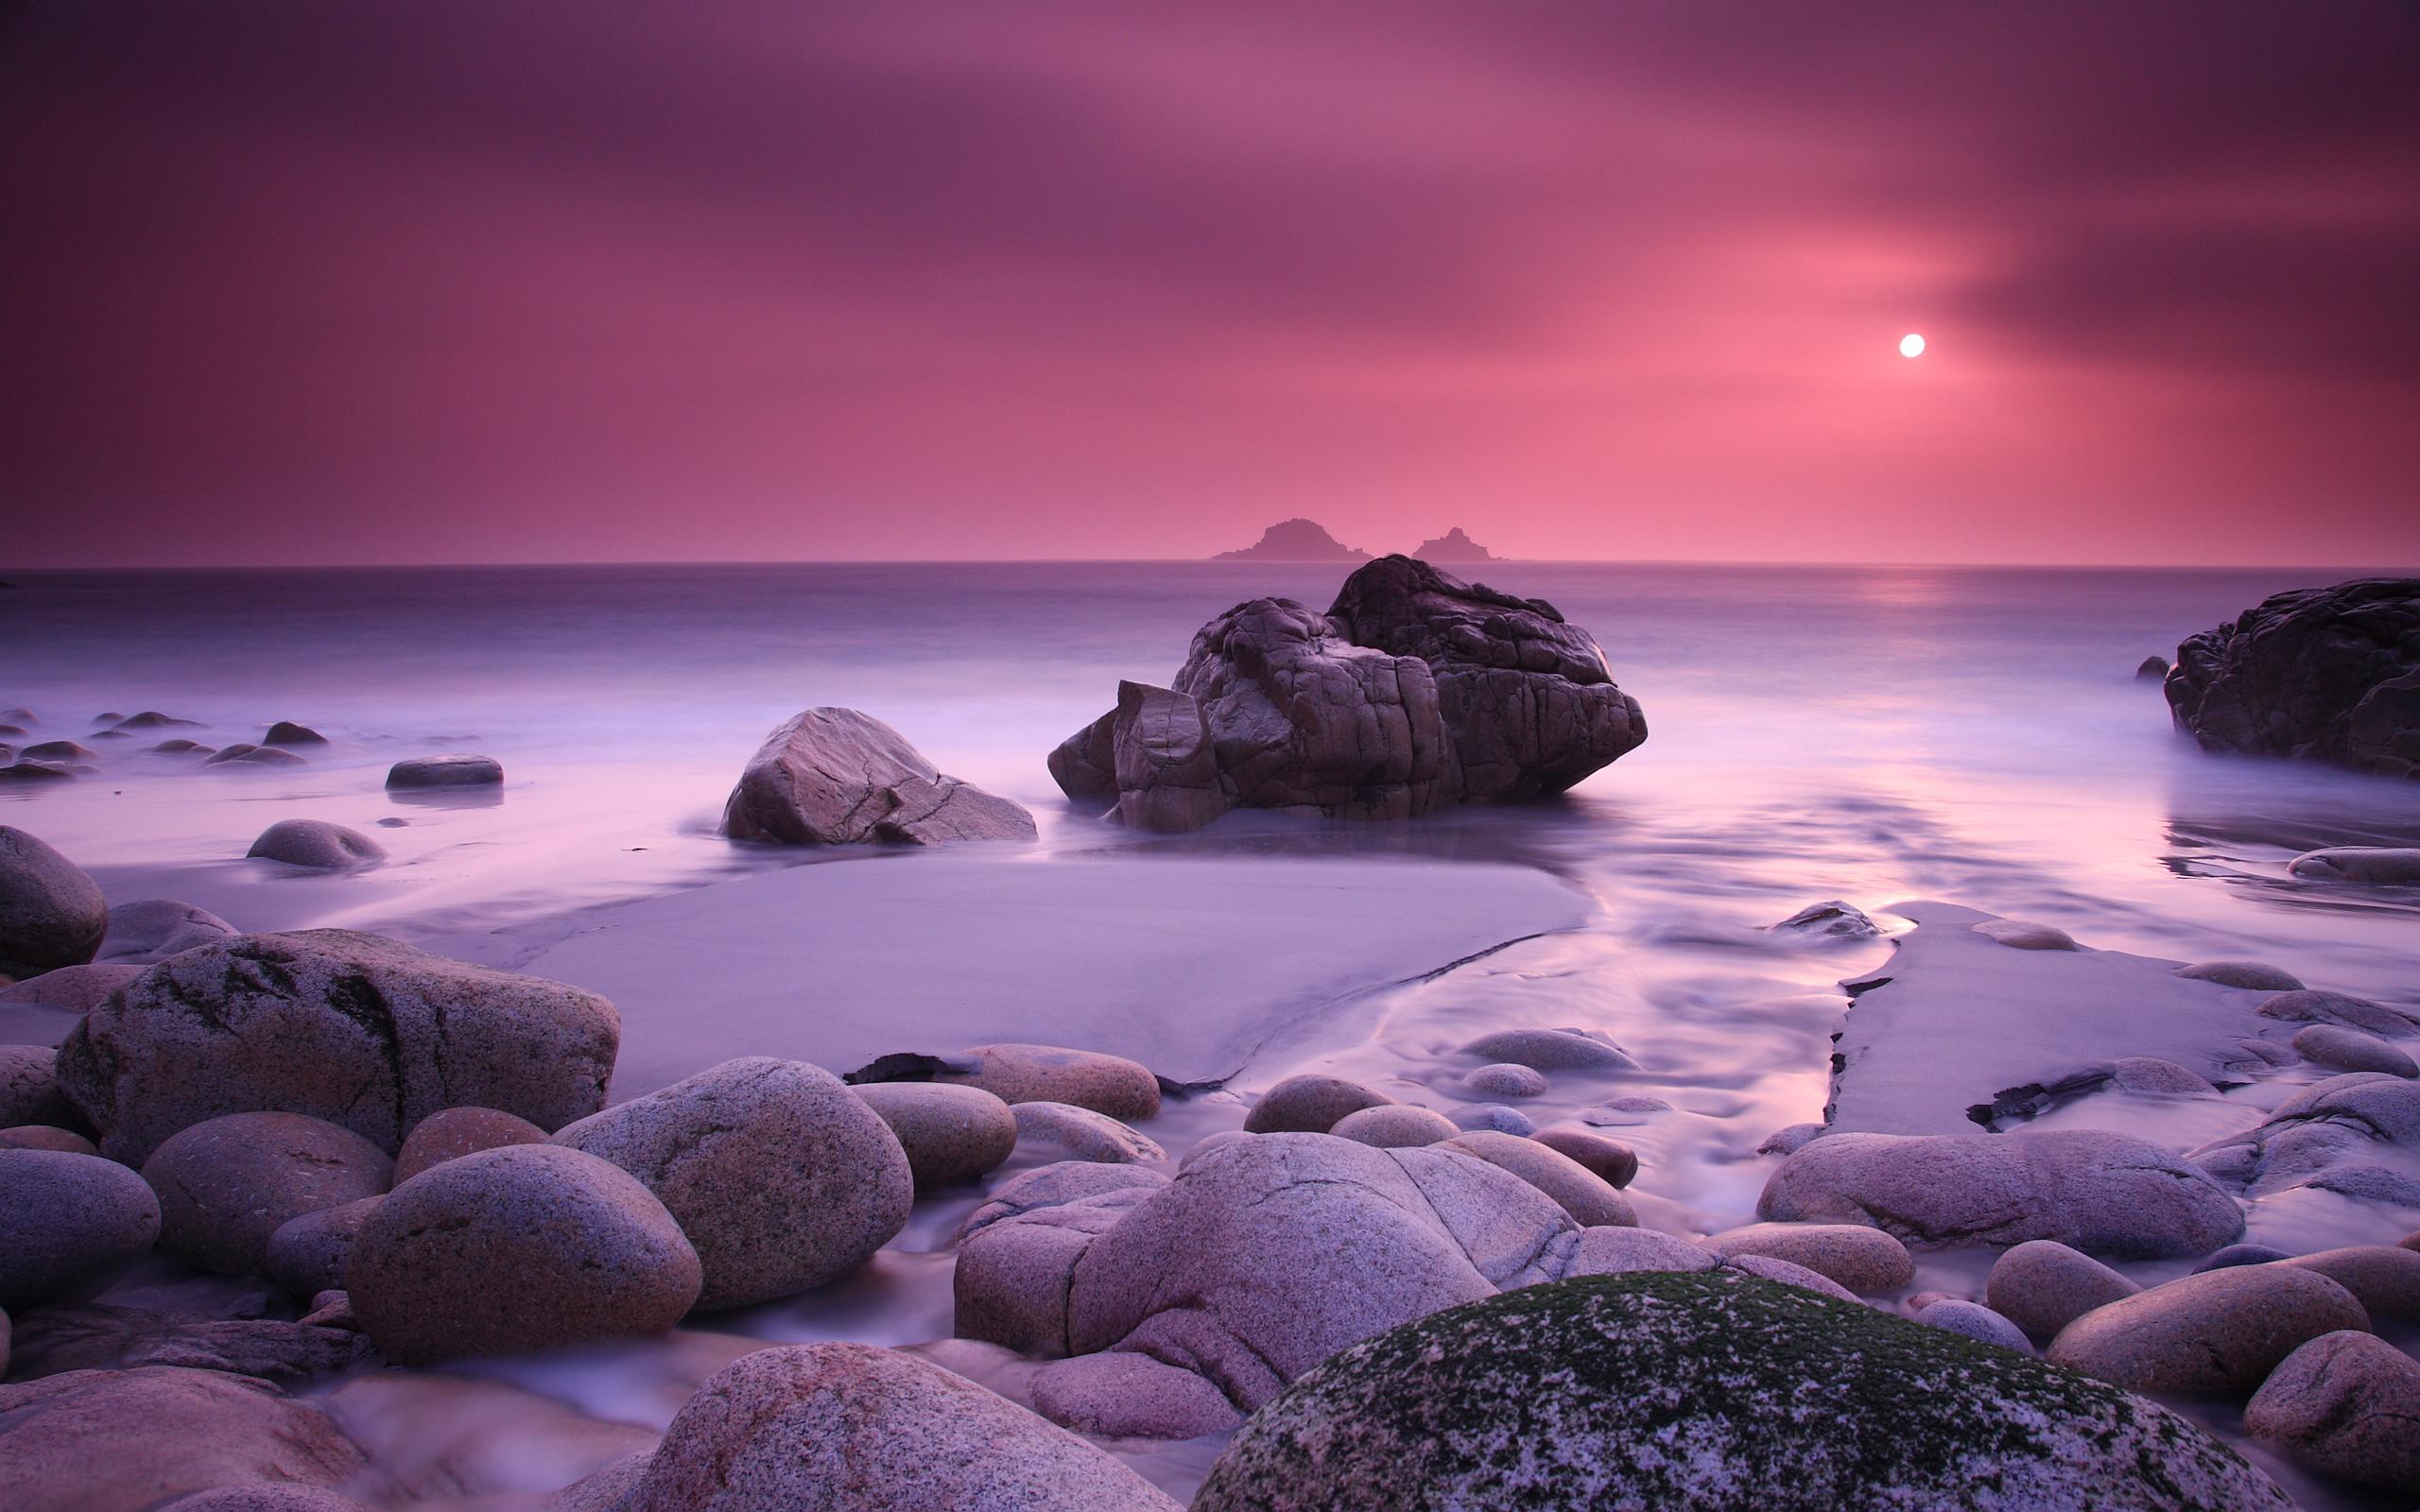 beautiful sunset wallpaper pink - HD Desktop Wallpapers ...